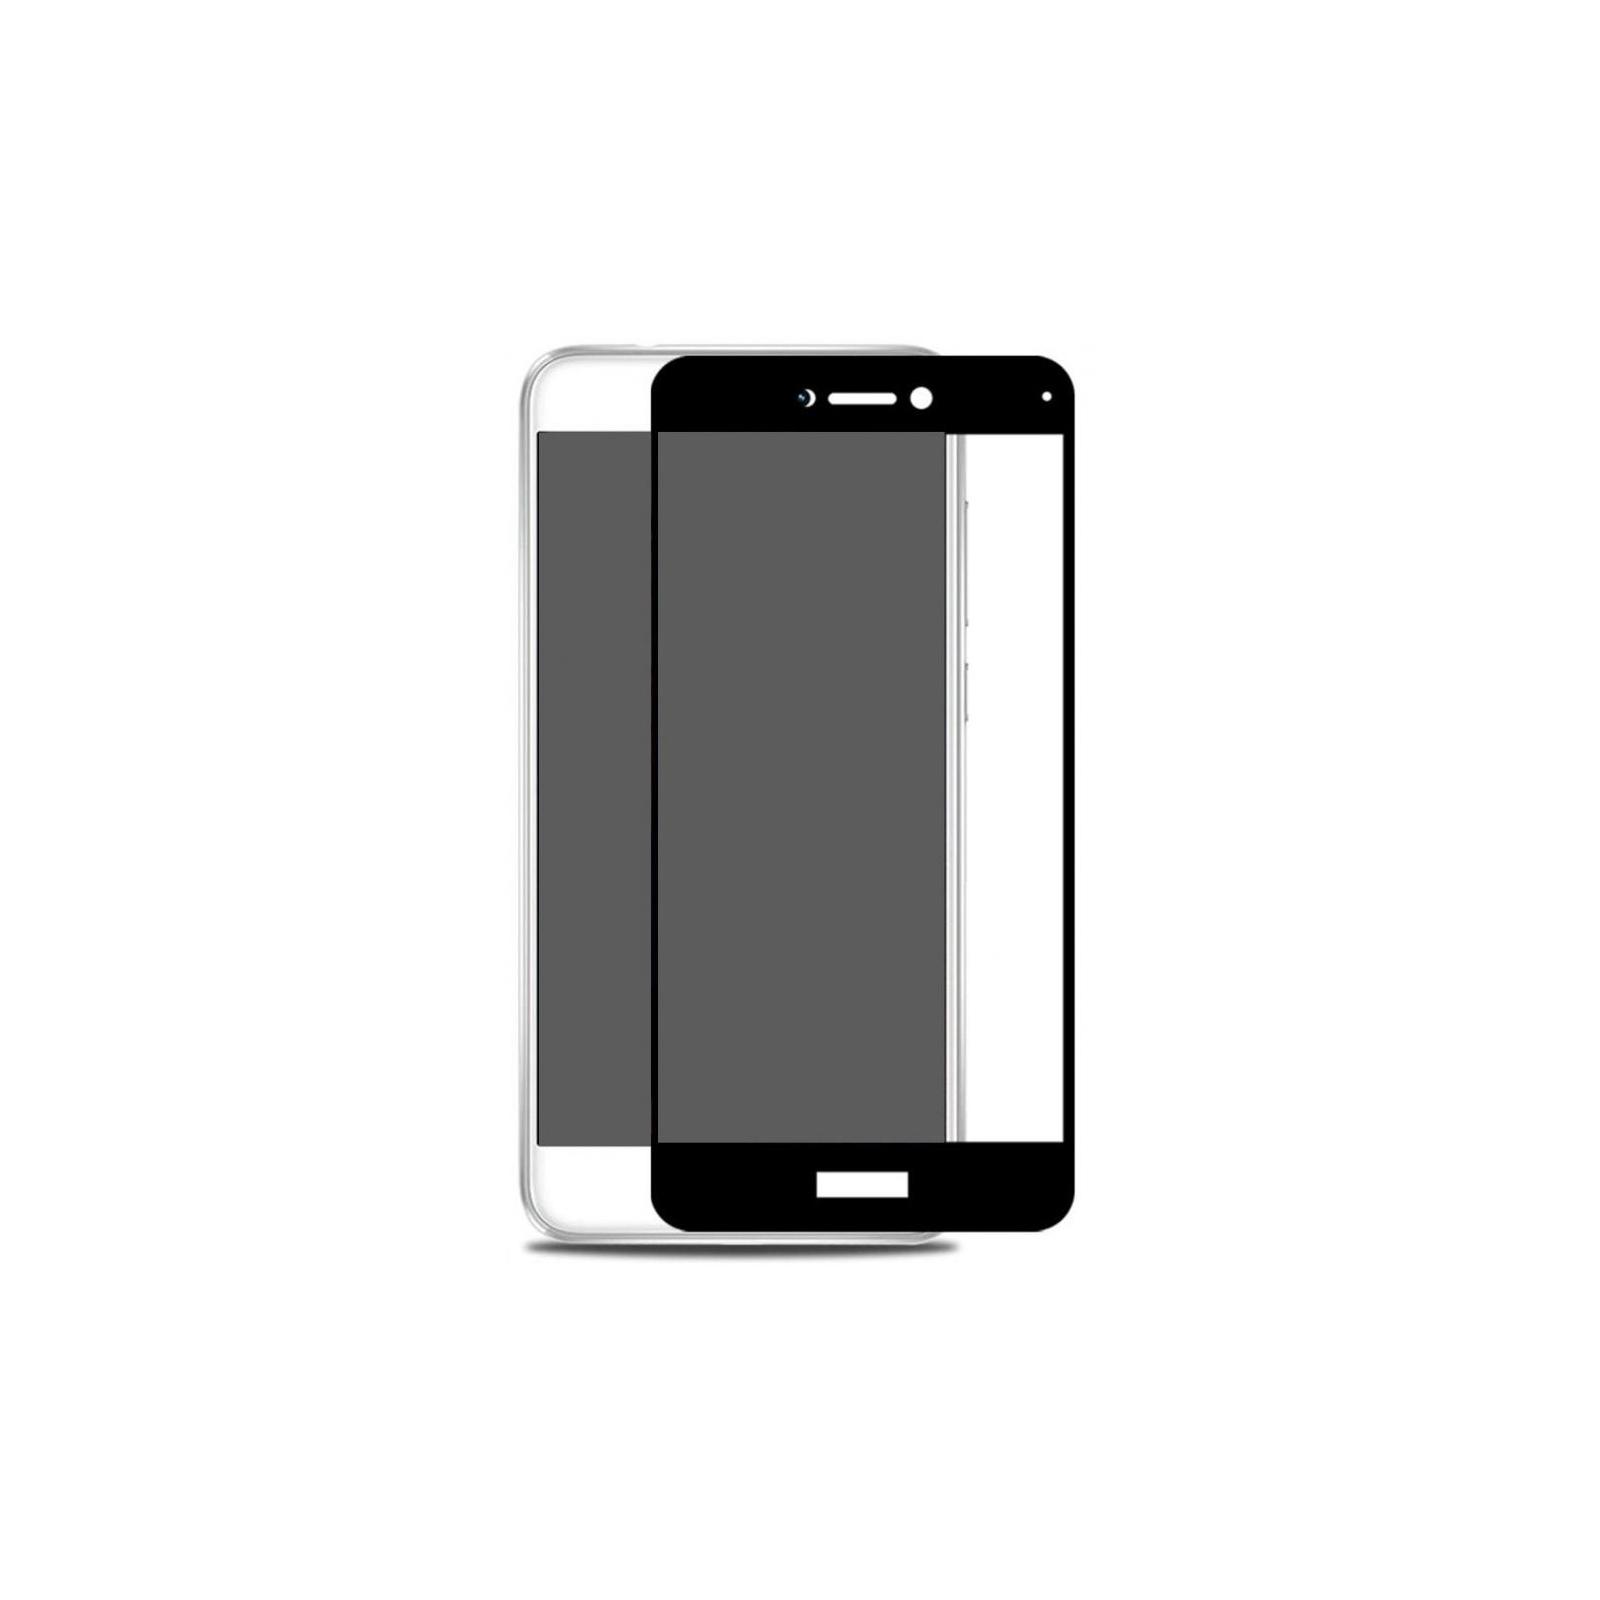 Стекло защитное Drobak для Honor 8 Lite Black Full screen (448413) изображение 2